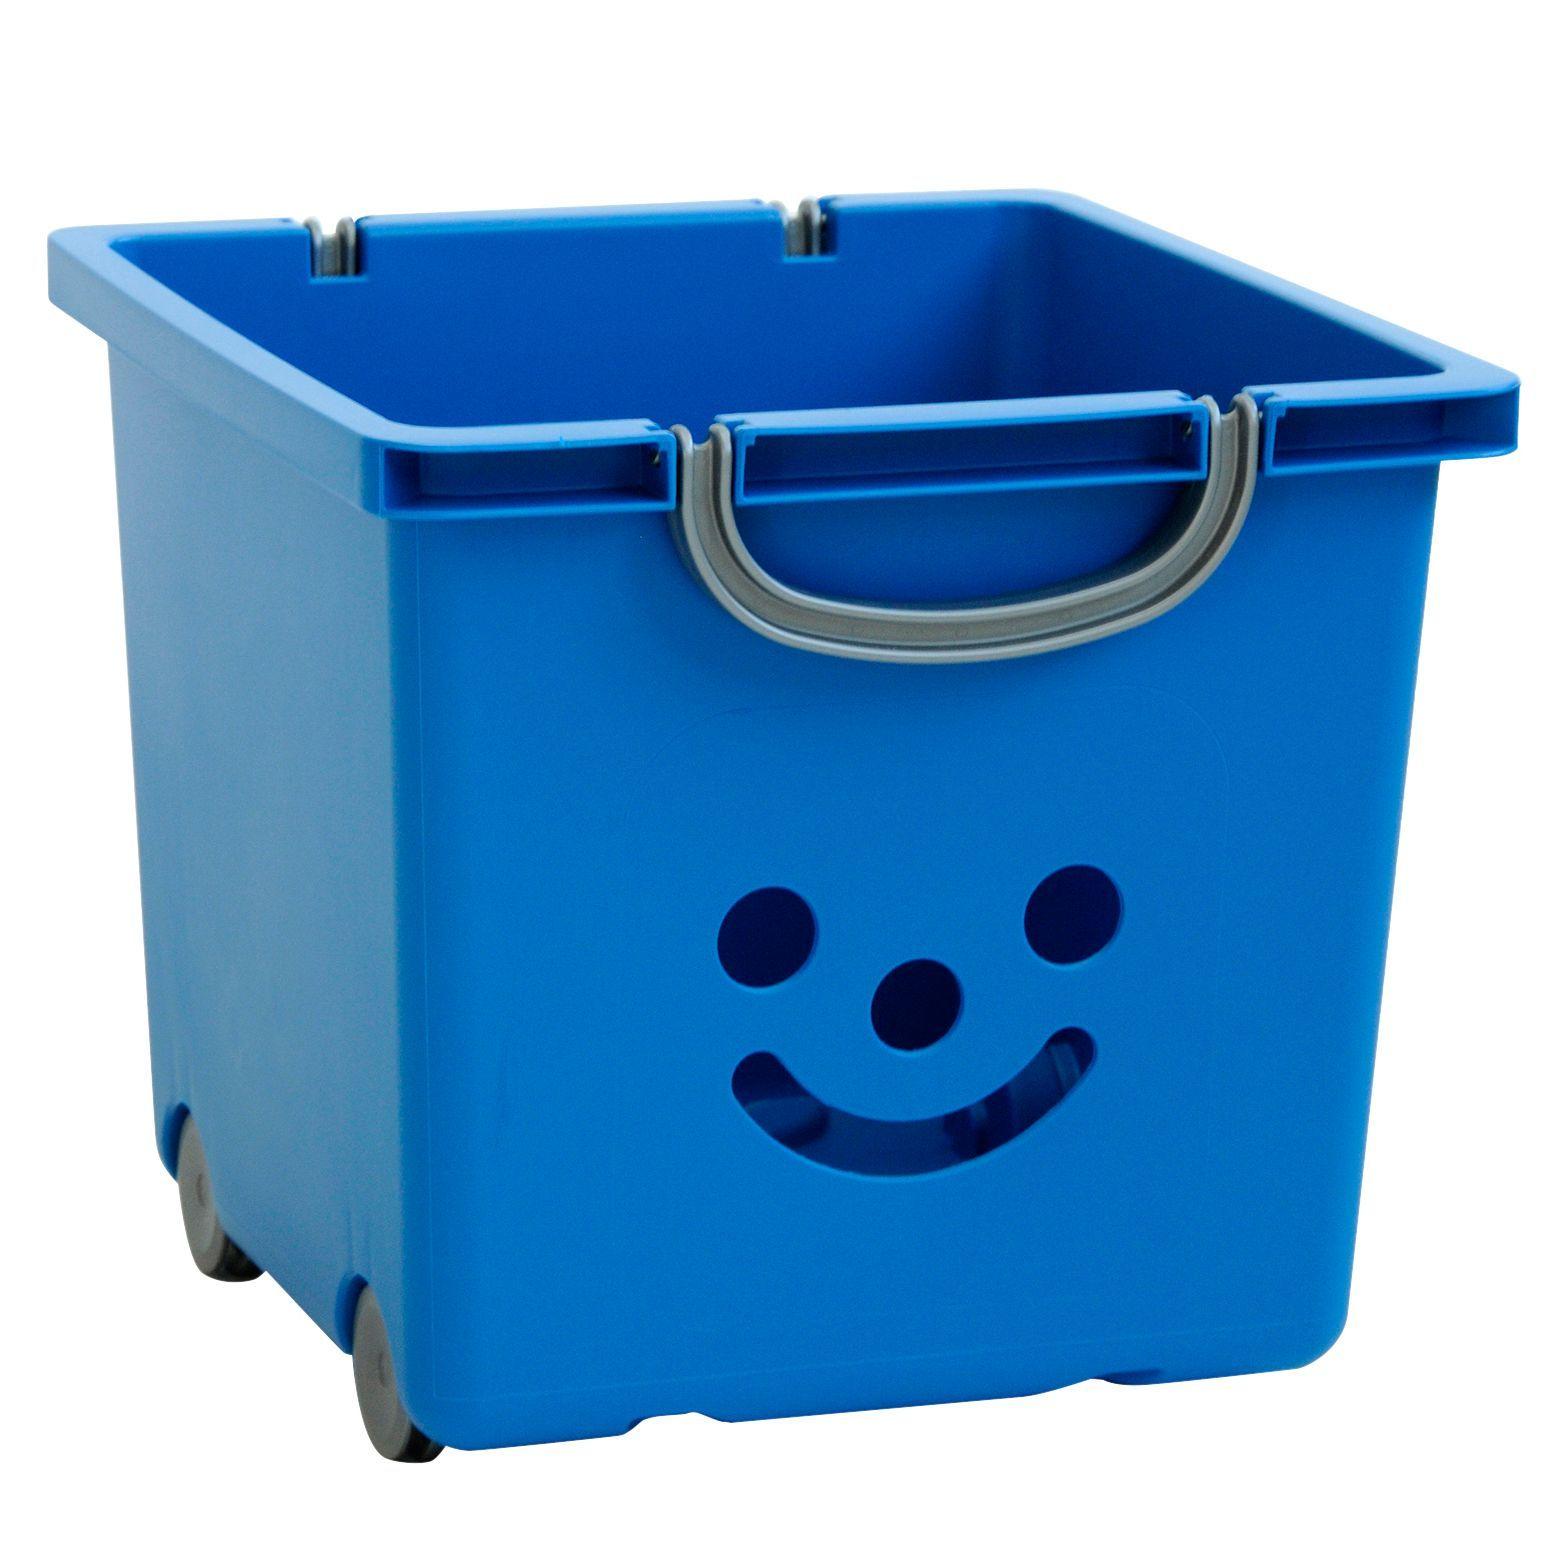 Childrenu0027s Smiley Blue 30.6L Plastic Storage Basket  sc 1 st  Pinterest & Childrenu0027s Smiley Blue 30.6L Plastic Storage Basket | Plastic ...